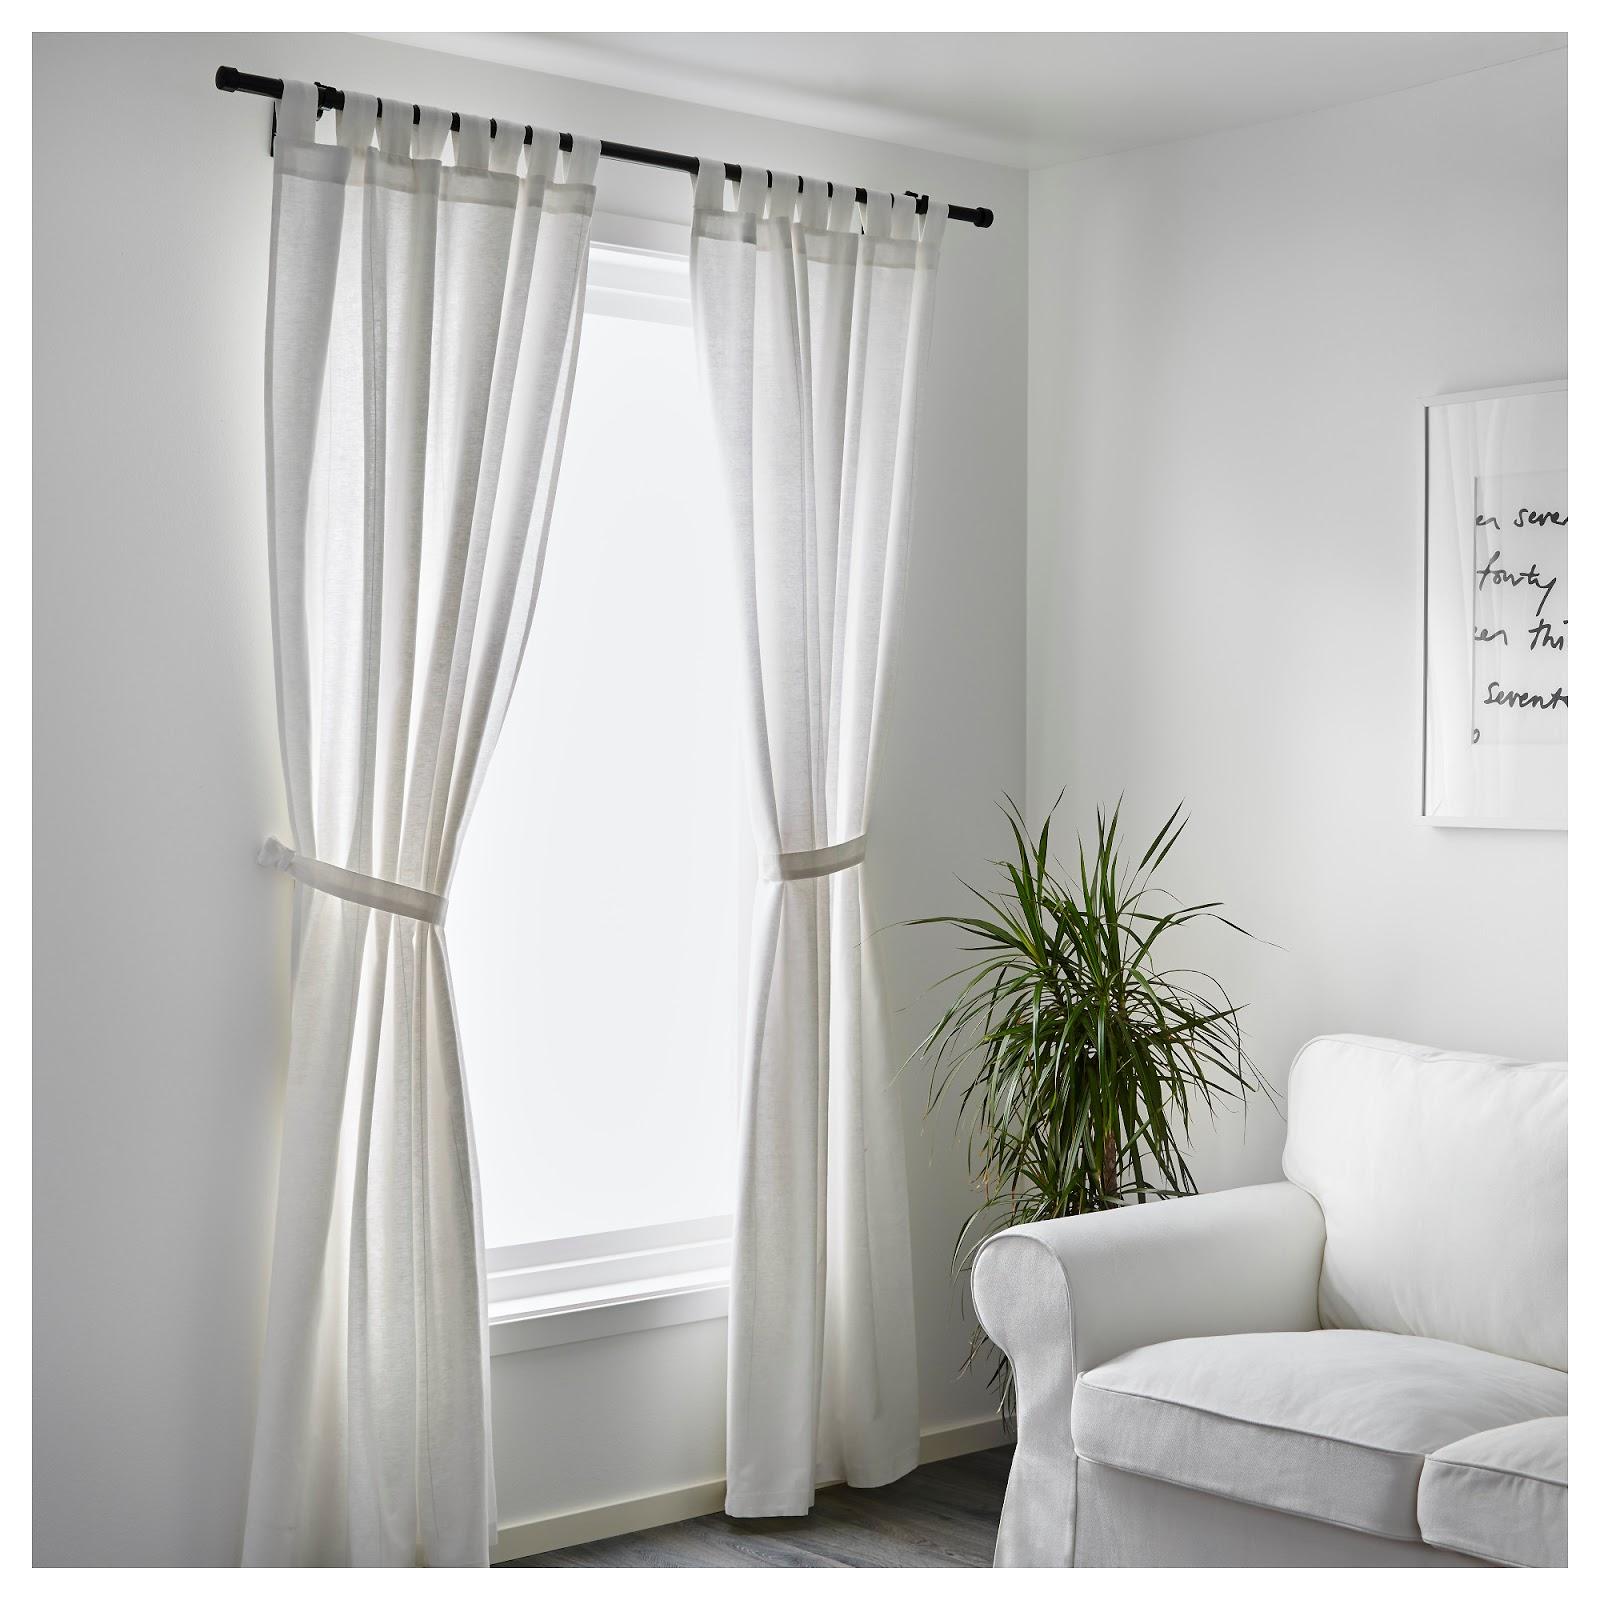 Curtain Poles Bay Window Windows Double Extra Long Finials